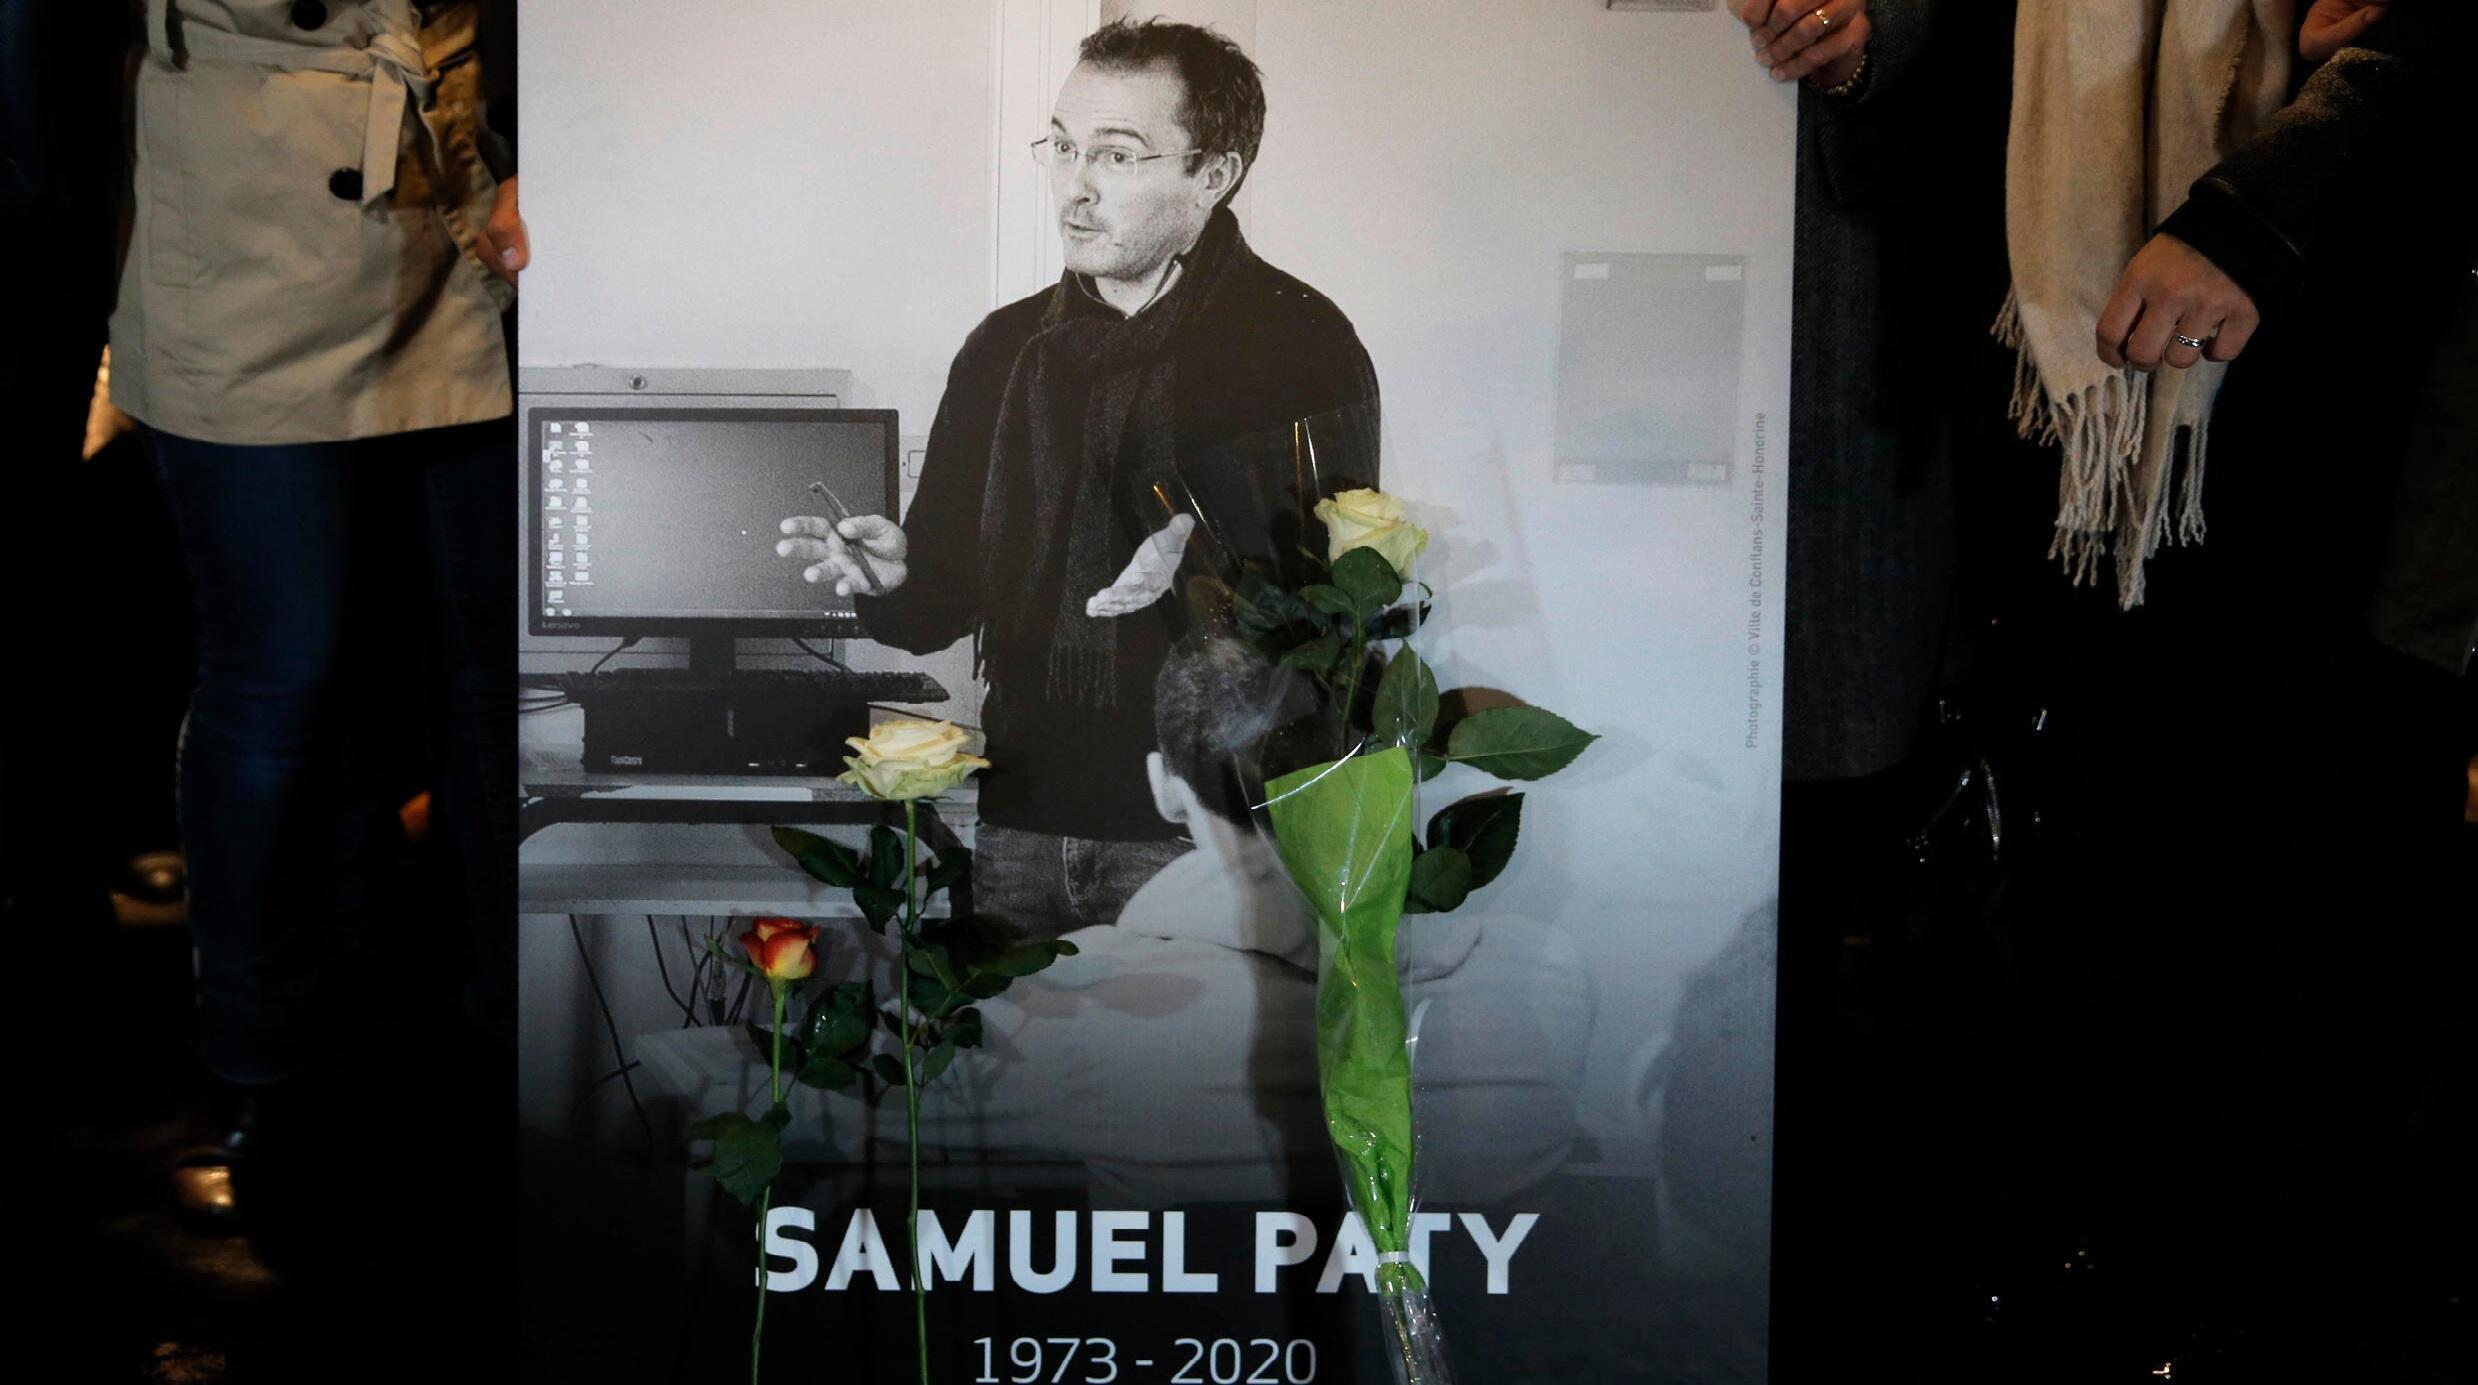 2020-10-21 france samuel paty tribute photo